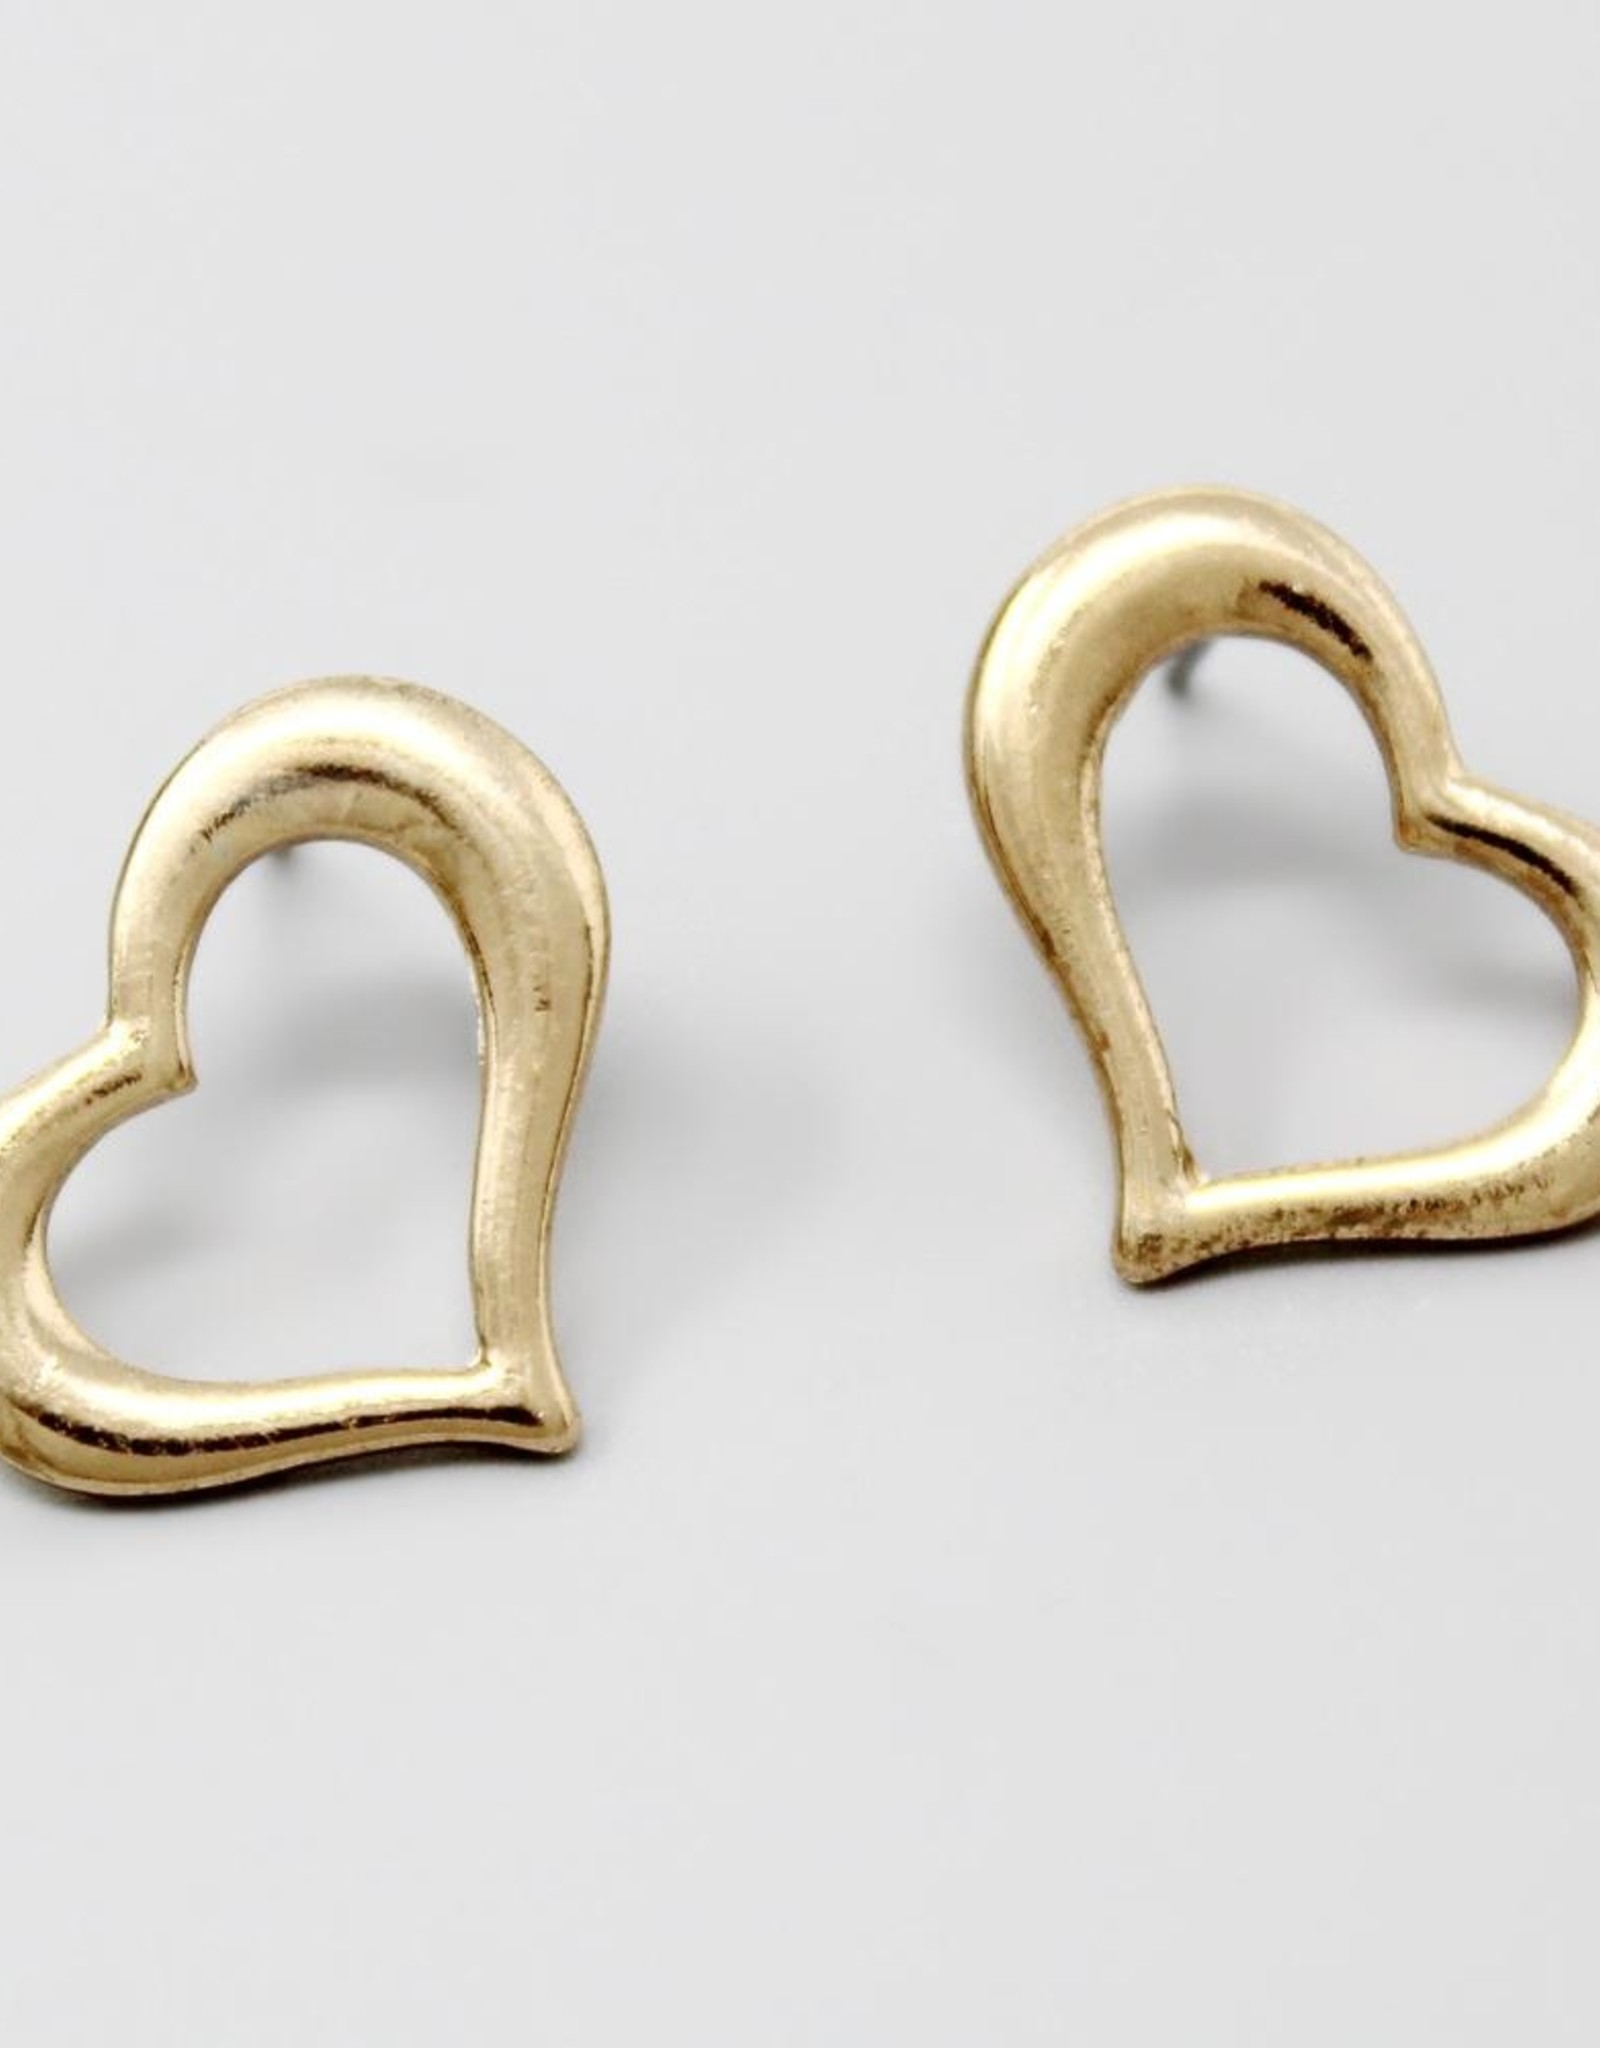 Heart Outline Stud Earrings